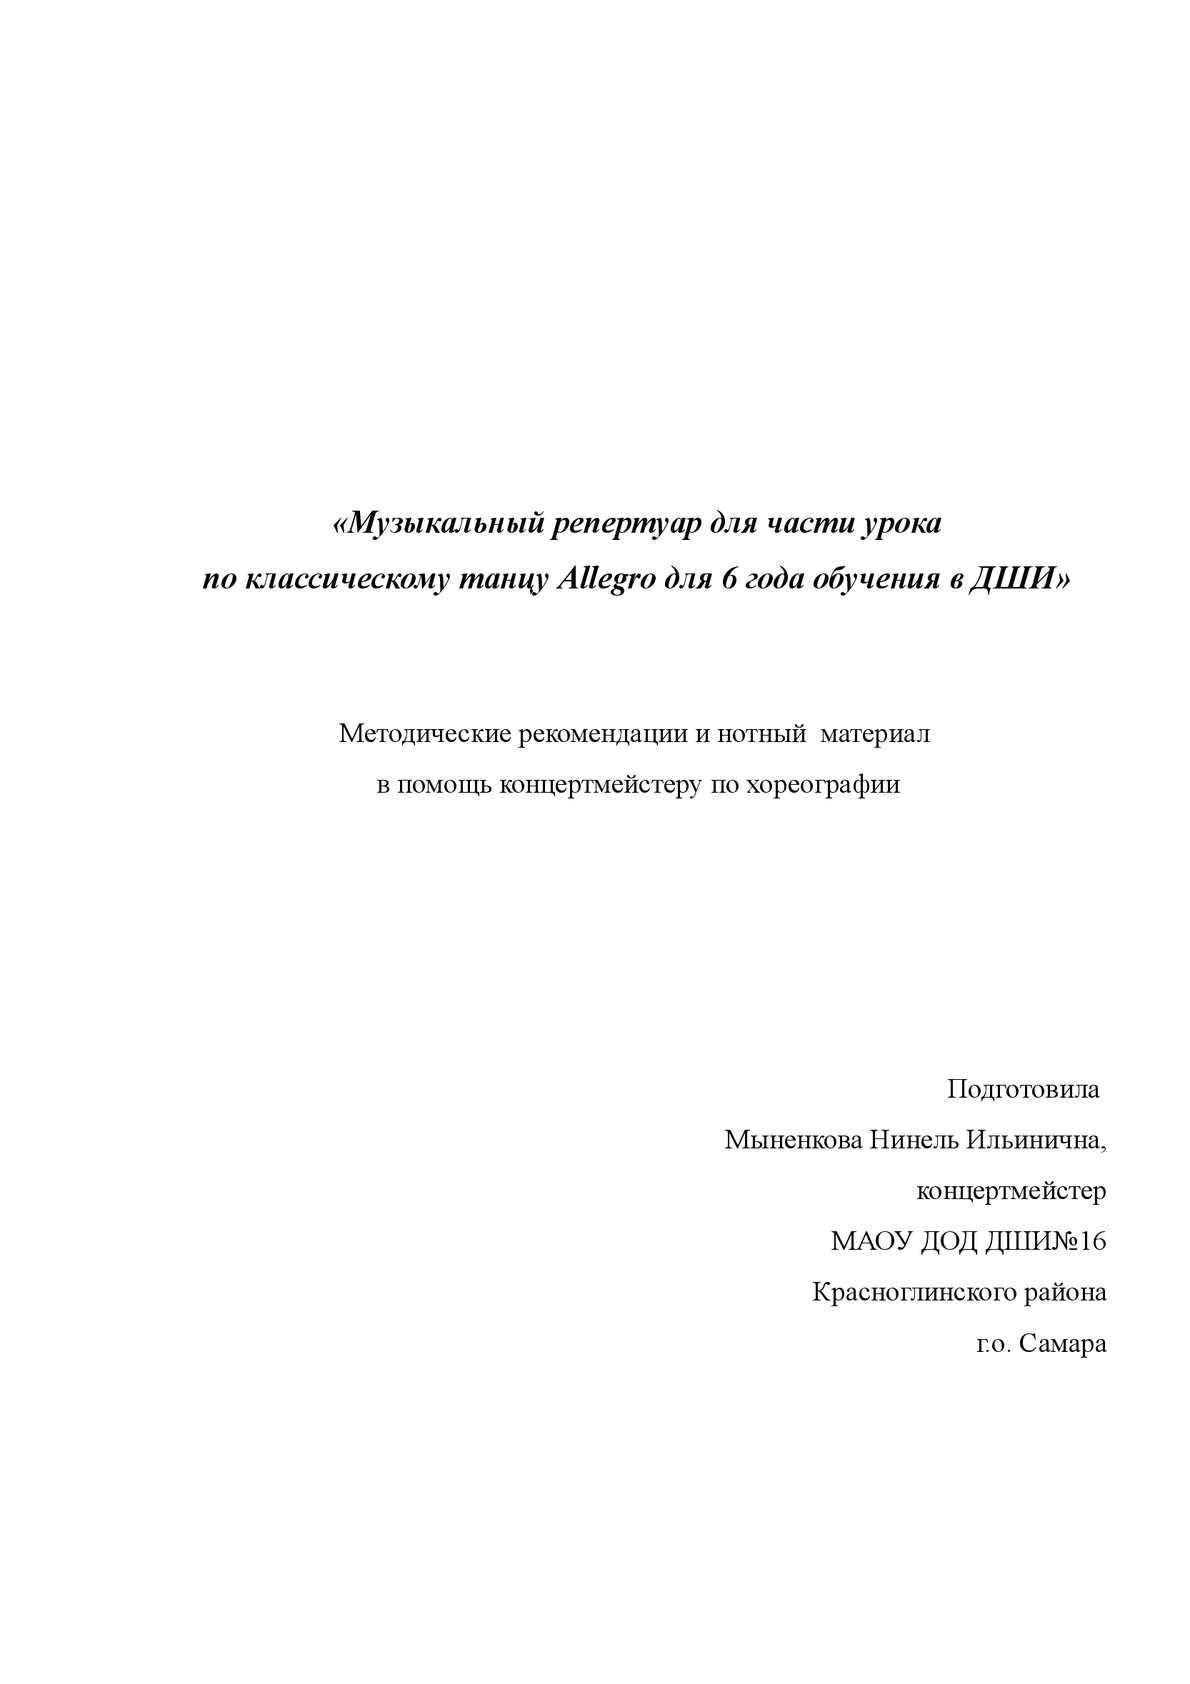 shop Concrete Repair, Rehabilitation and Retrofitting IV: Proceedings of the 4th International Conference